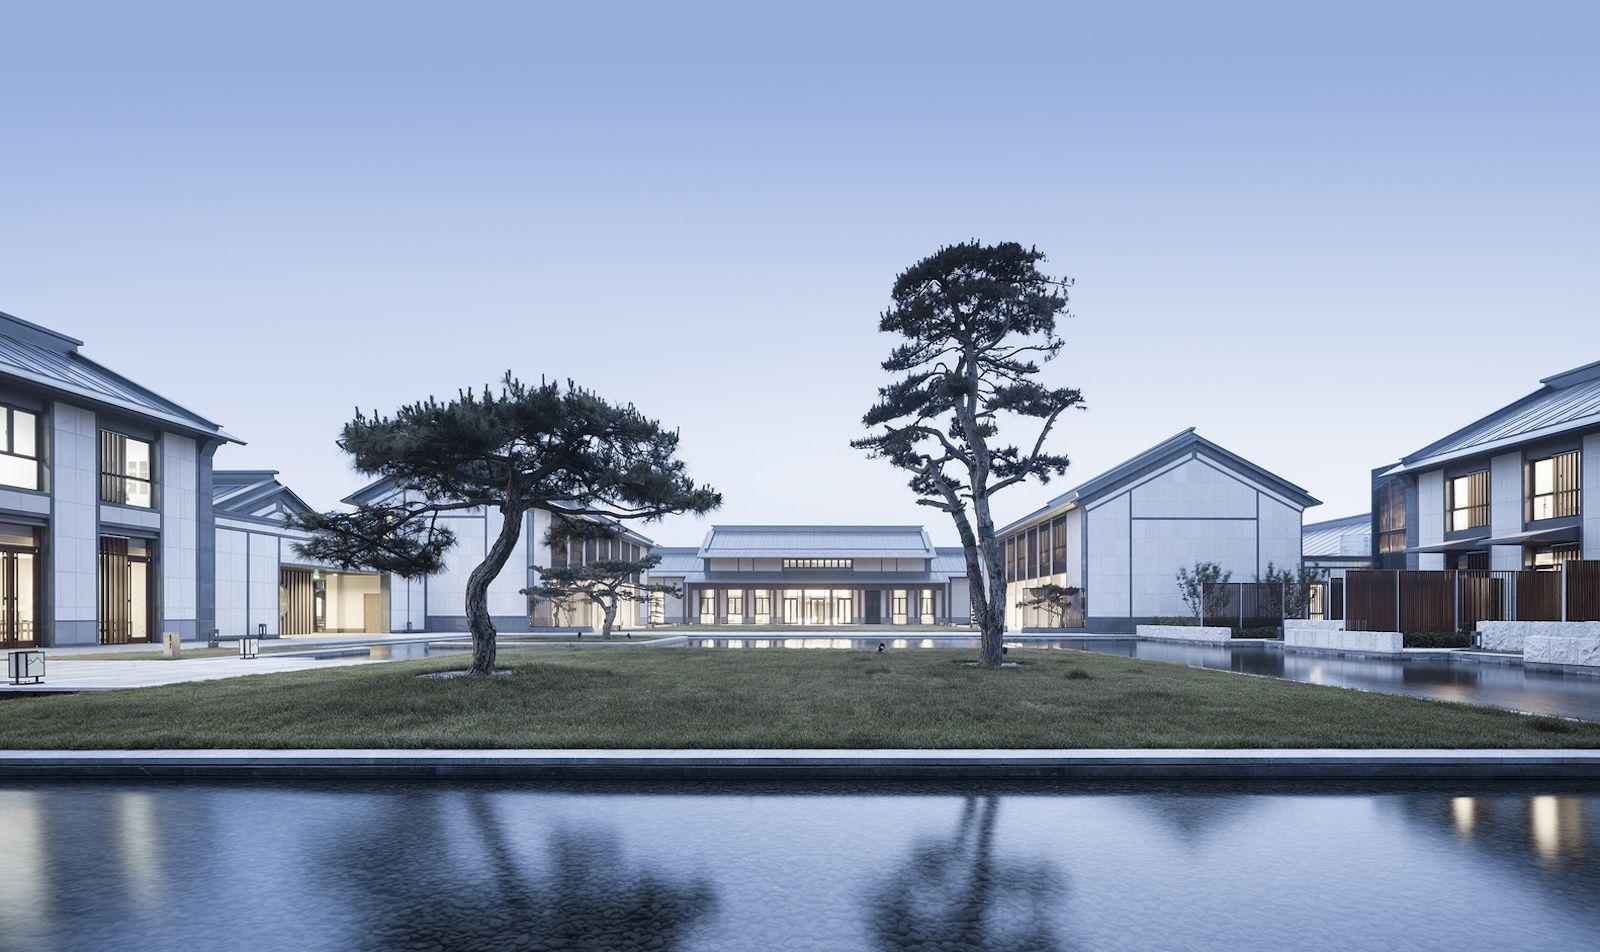 16+ Pine lakes animal hospital ideas in 2021